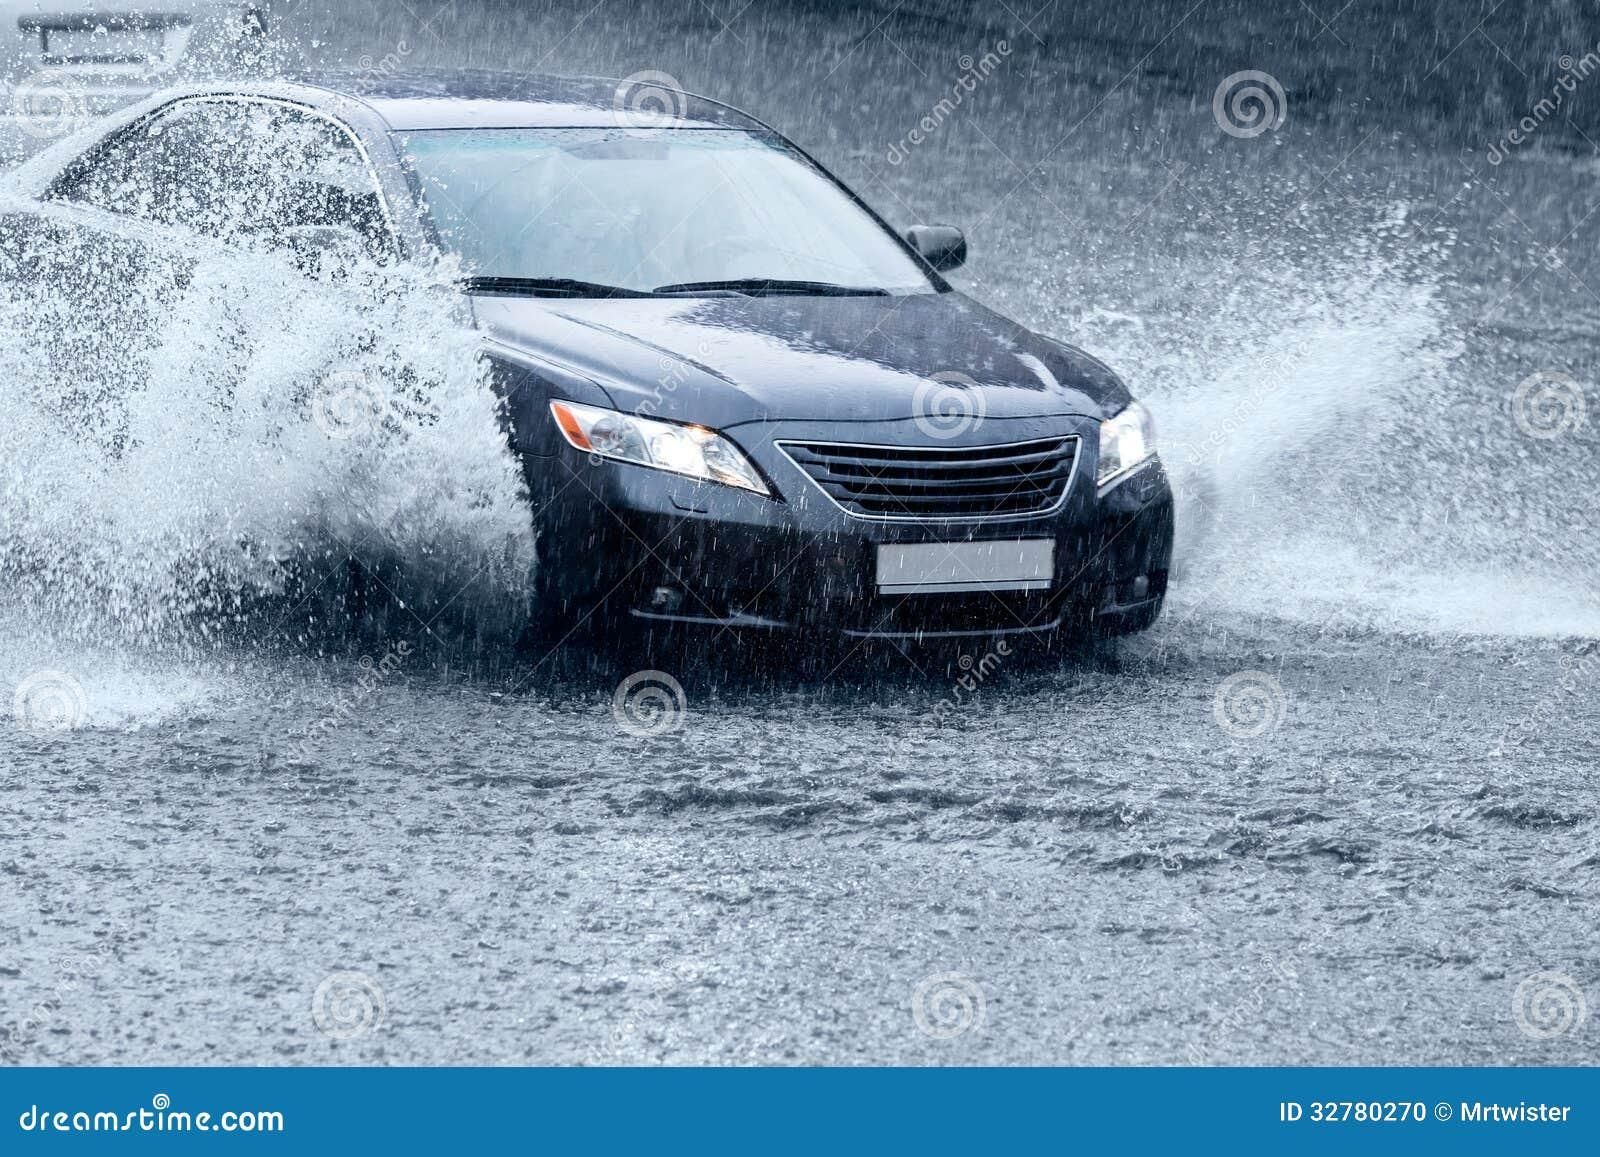 Car On Wet Road Stock Photo Image 32780270